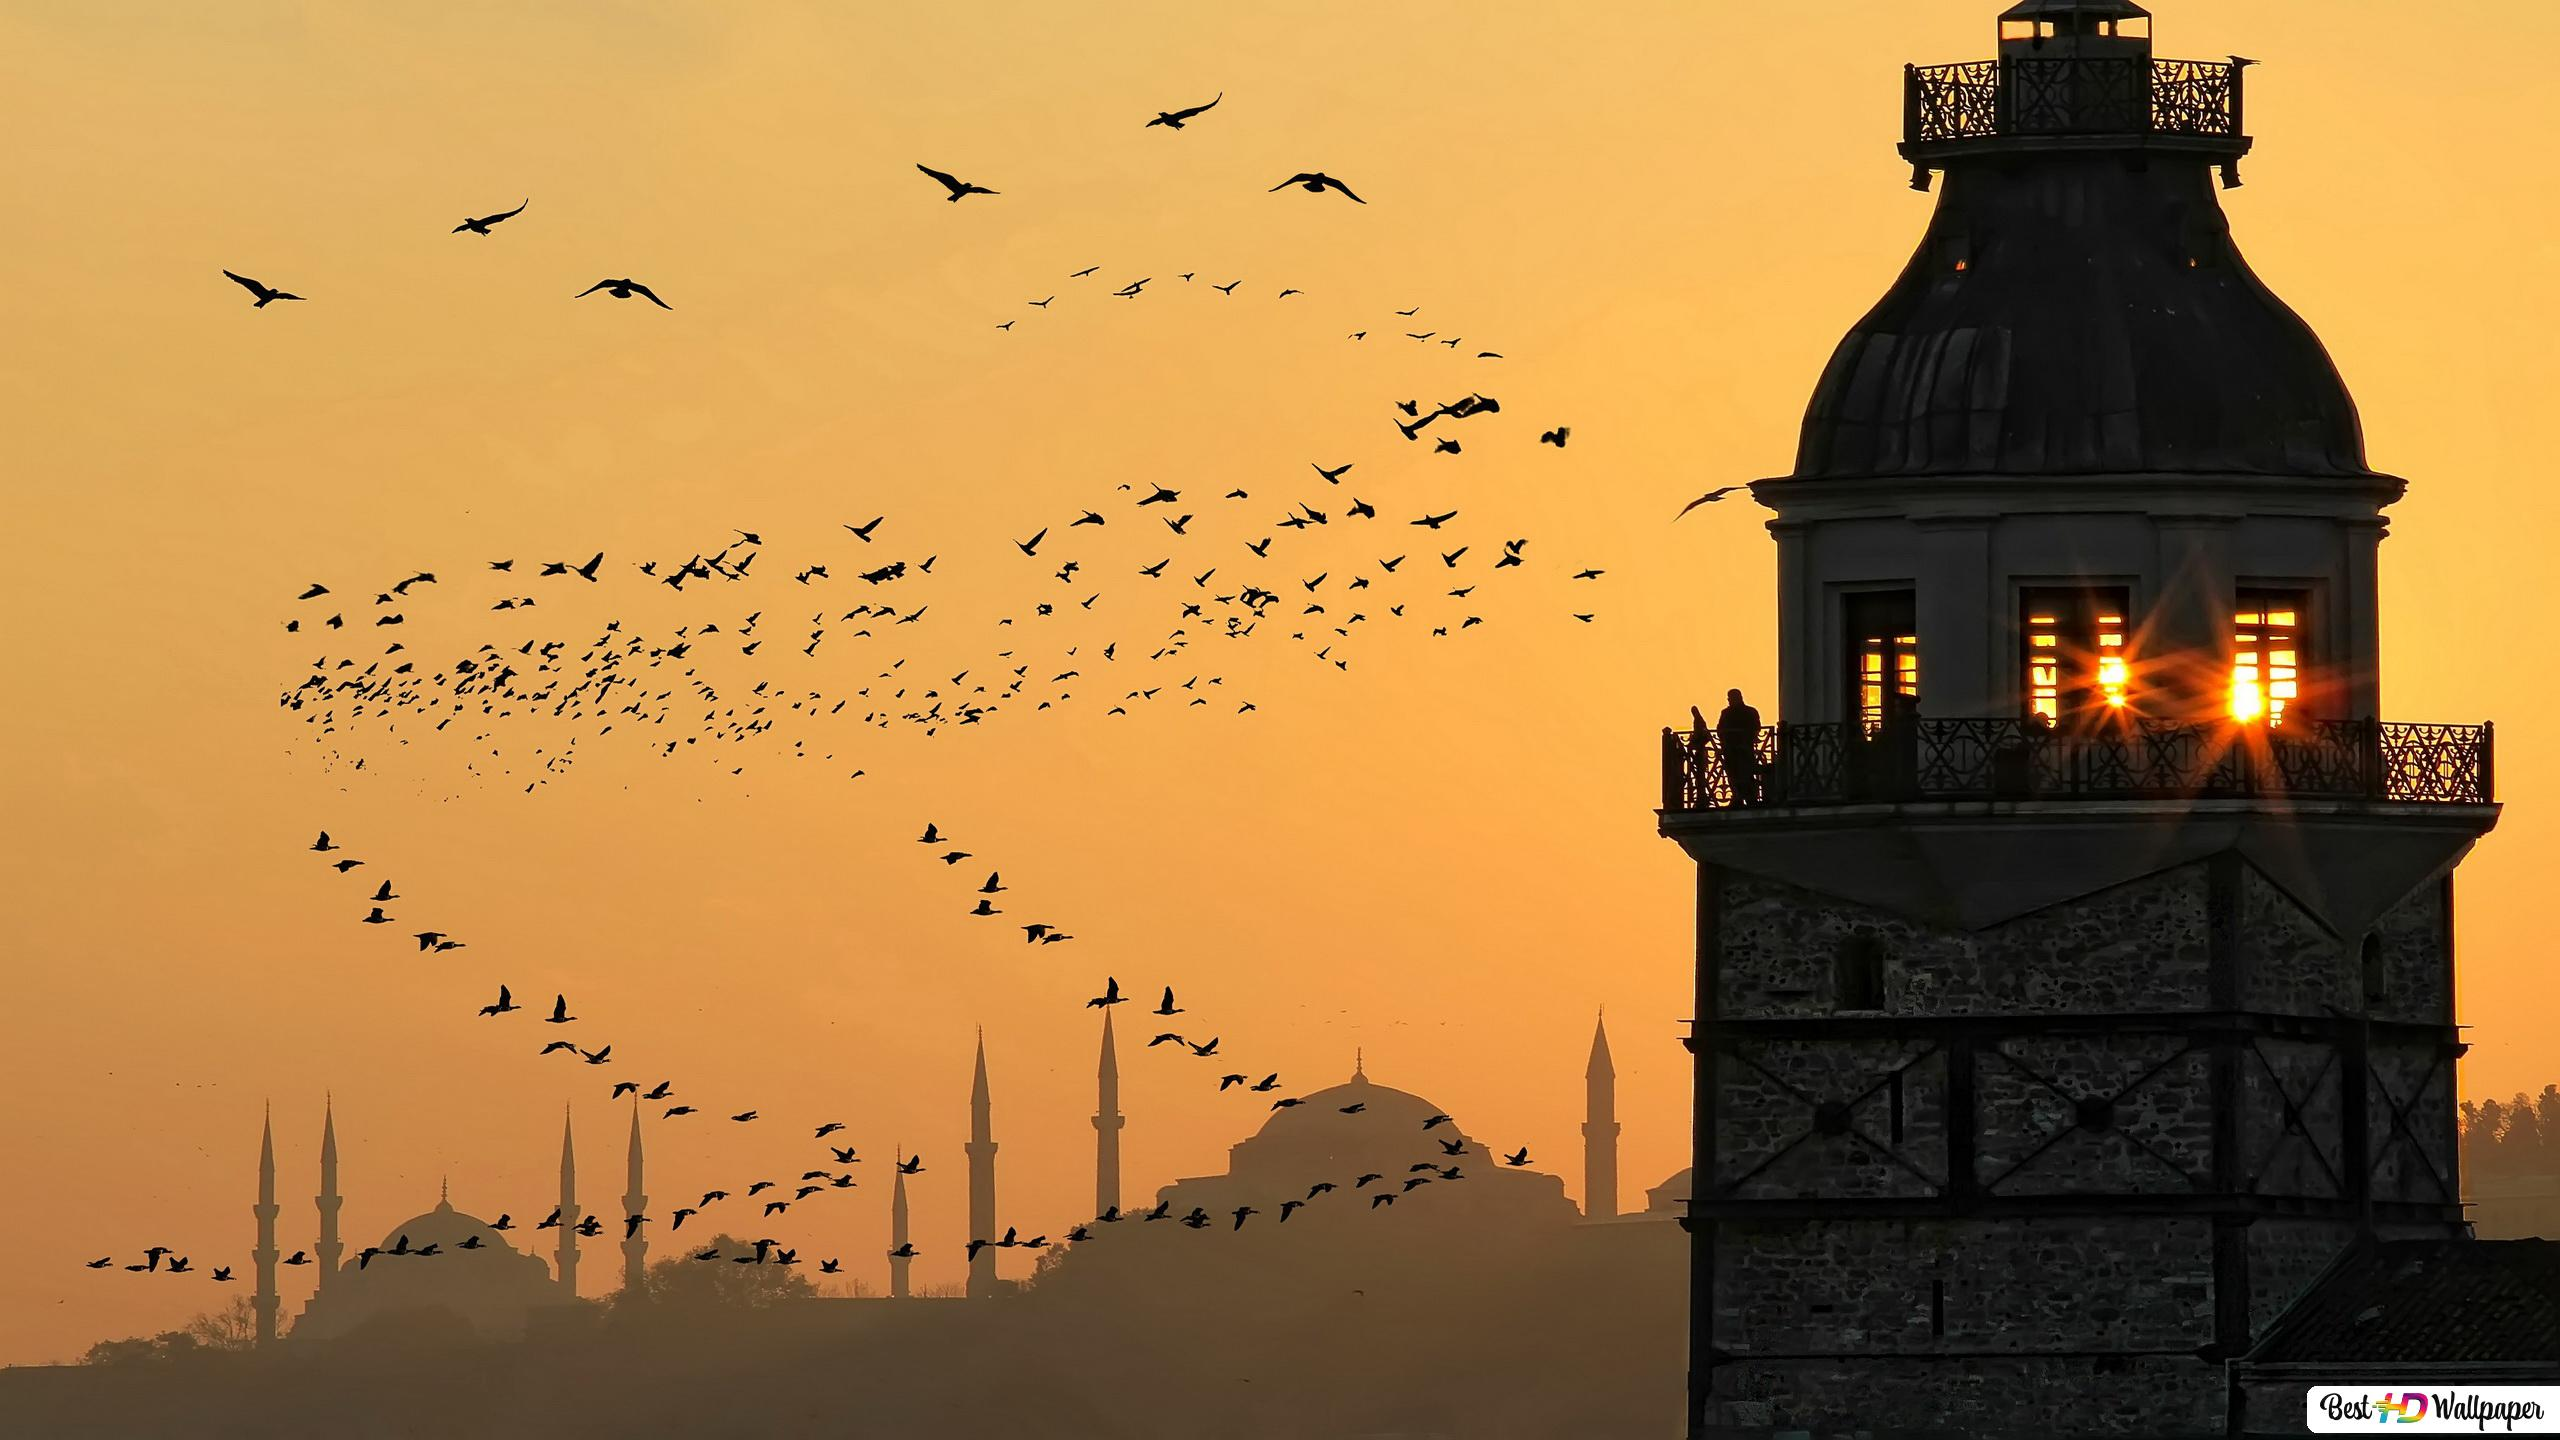 Menara Perawan Atau Kizkulesi Dalam Bahasa Turki Di Istanbul Fotografi Dengan Burung Dan Bayangan Masjid Biru Unduhan Wallpaper Hd